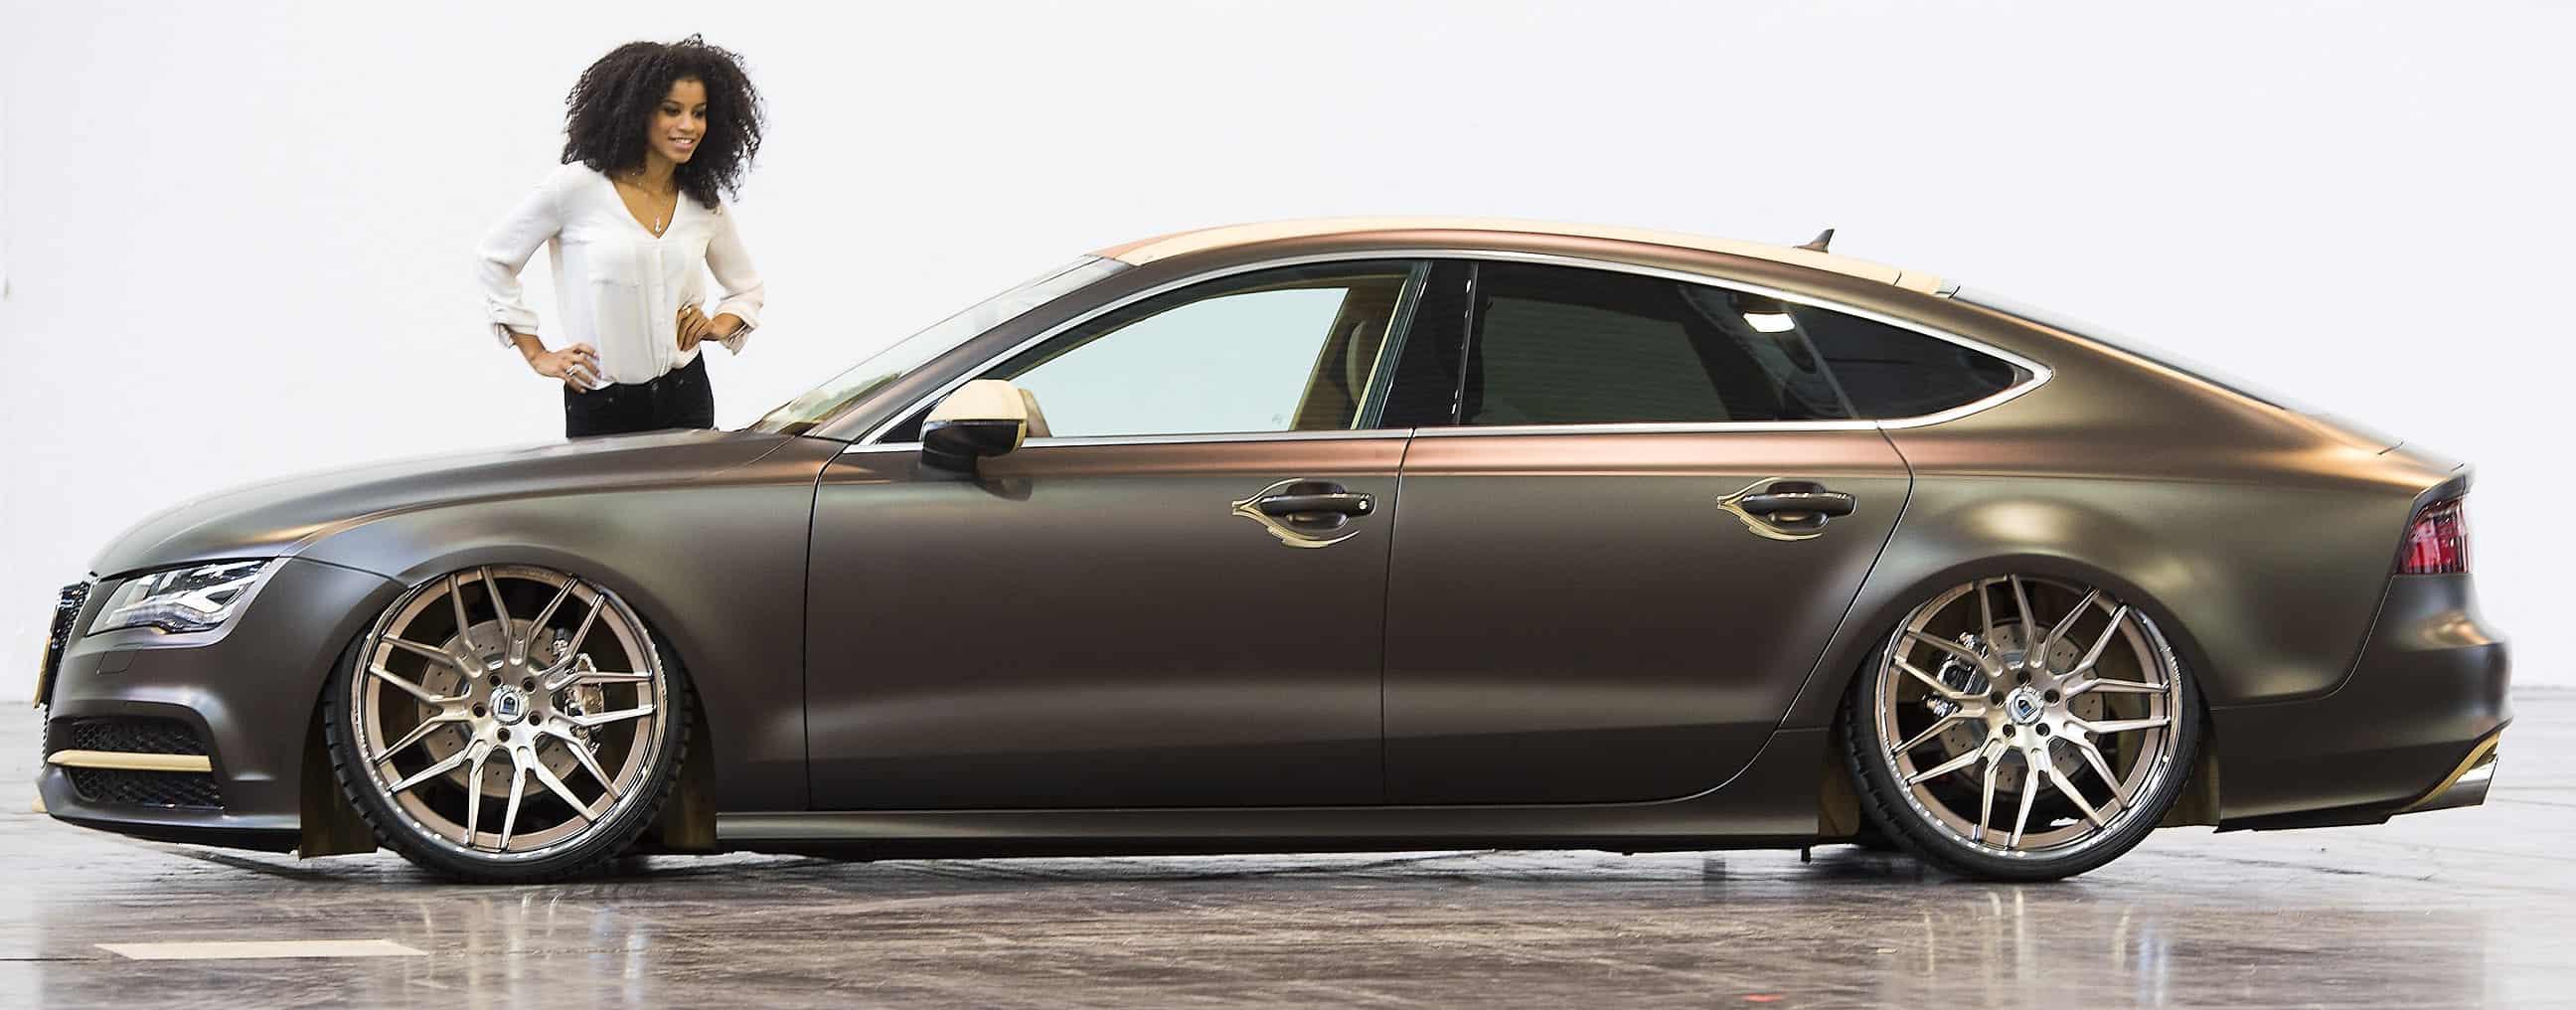 Audi A7 Sportback mit Model Luisa